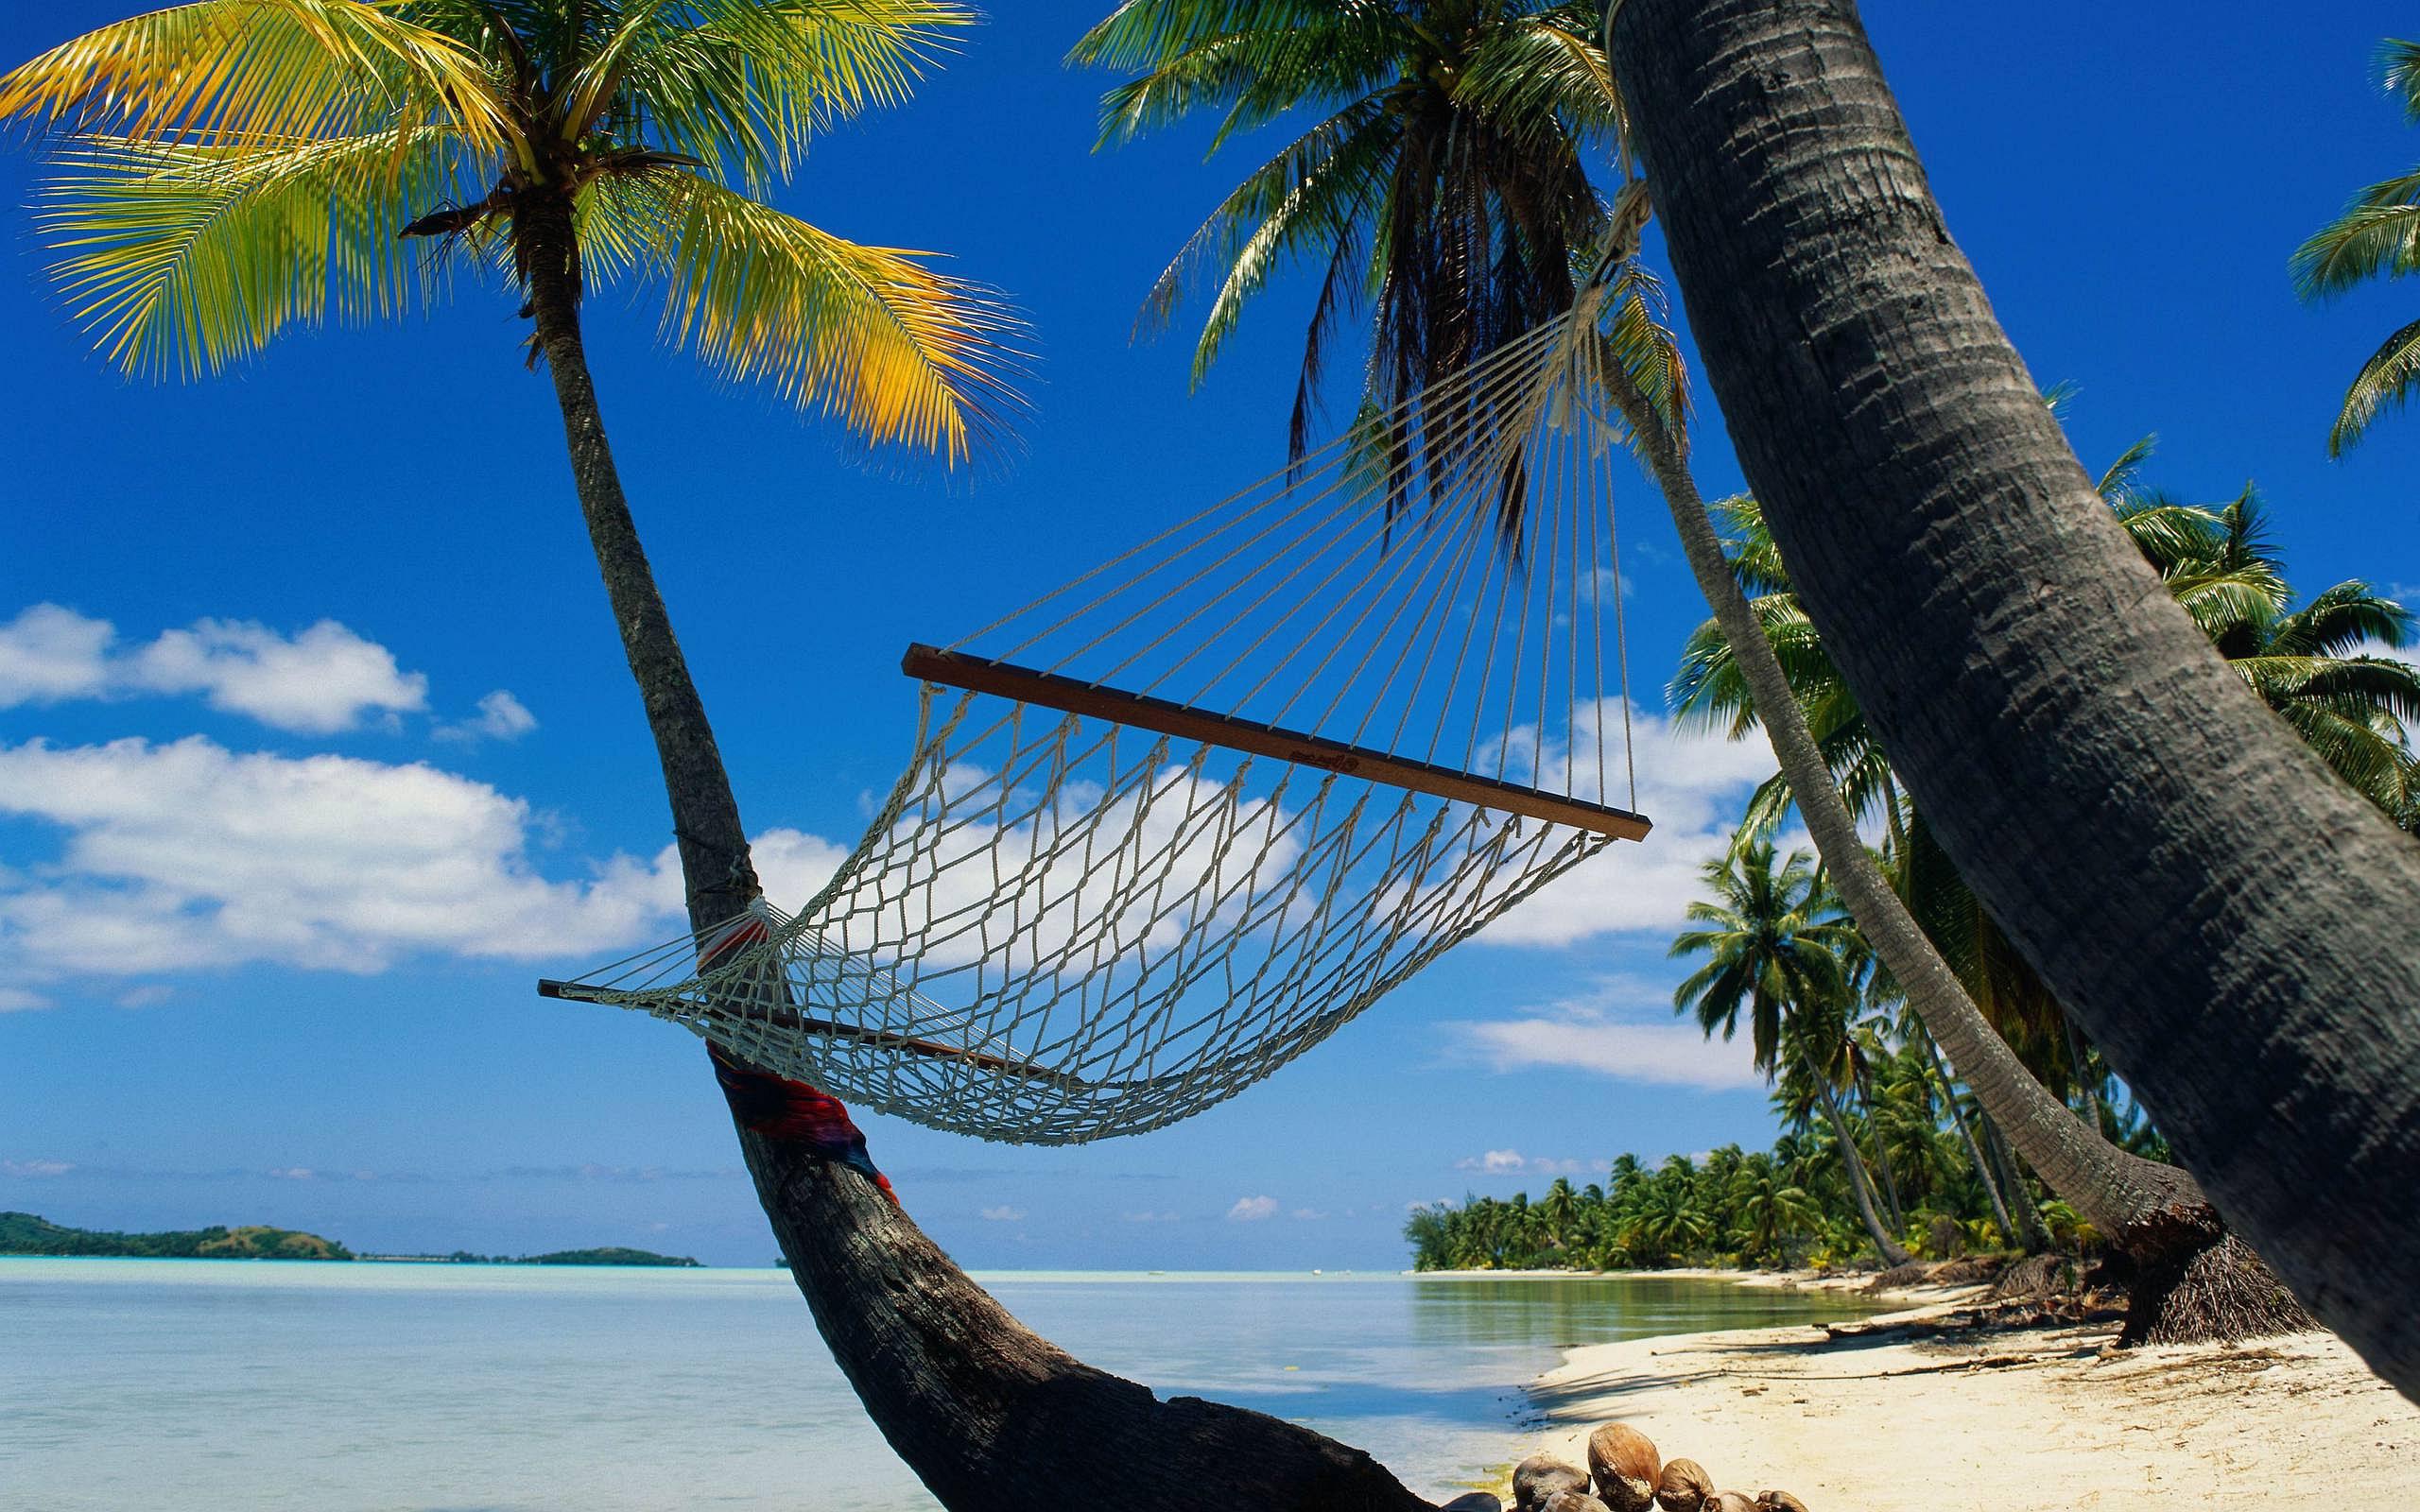 Tropical Ocean 3d Live Wallpaper Beach Palm Tree Hd Desktop Wallpapers 4k Hd